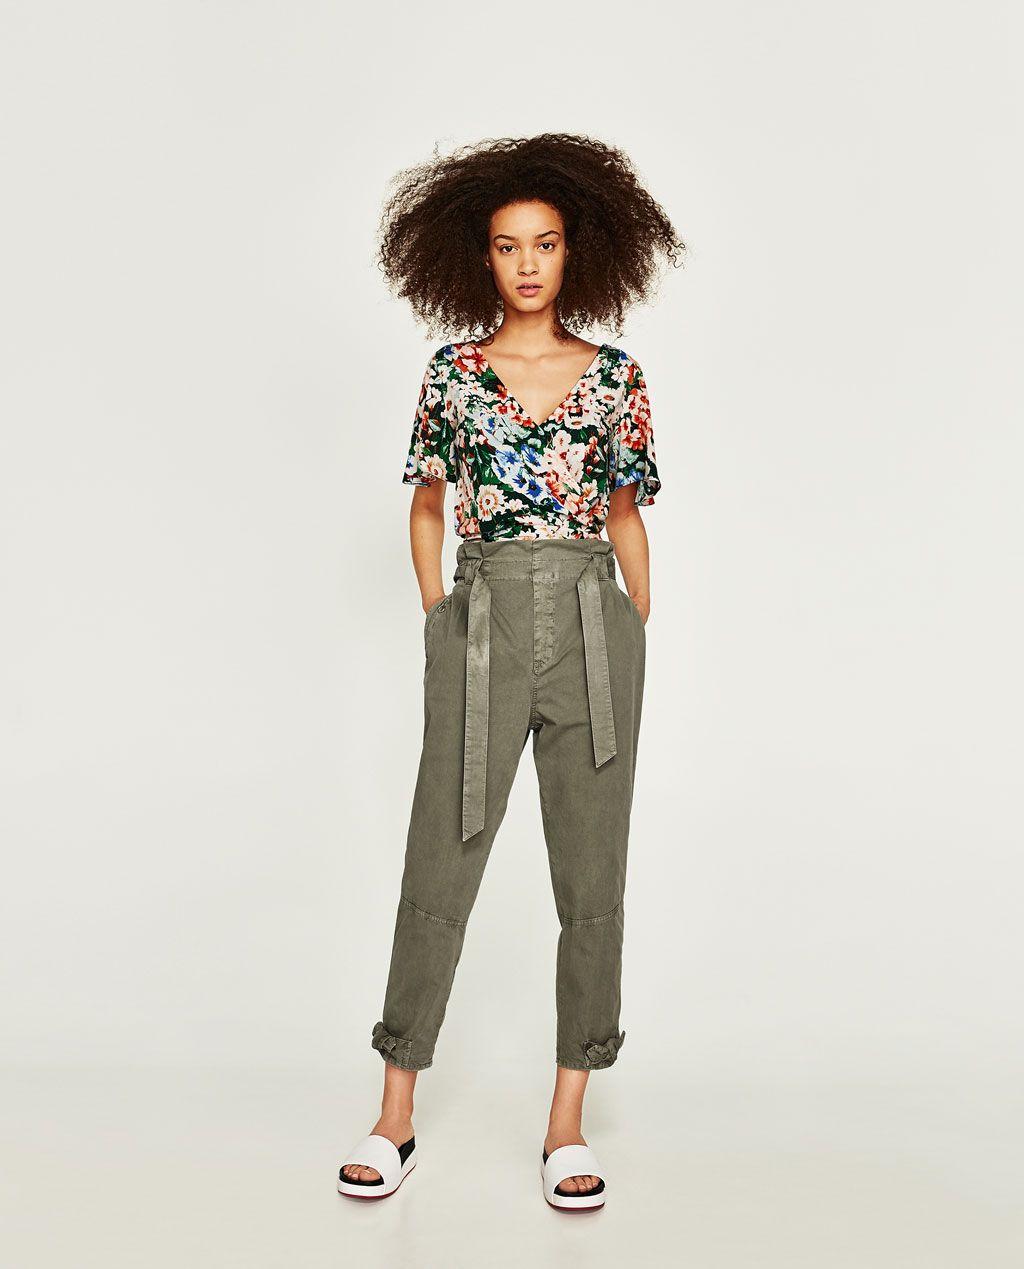 c4b567a6a8 PANTALÓN BAGGY LAZO | ANNA x STYLE | Baggy trousers, Trousers ...